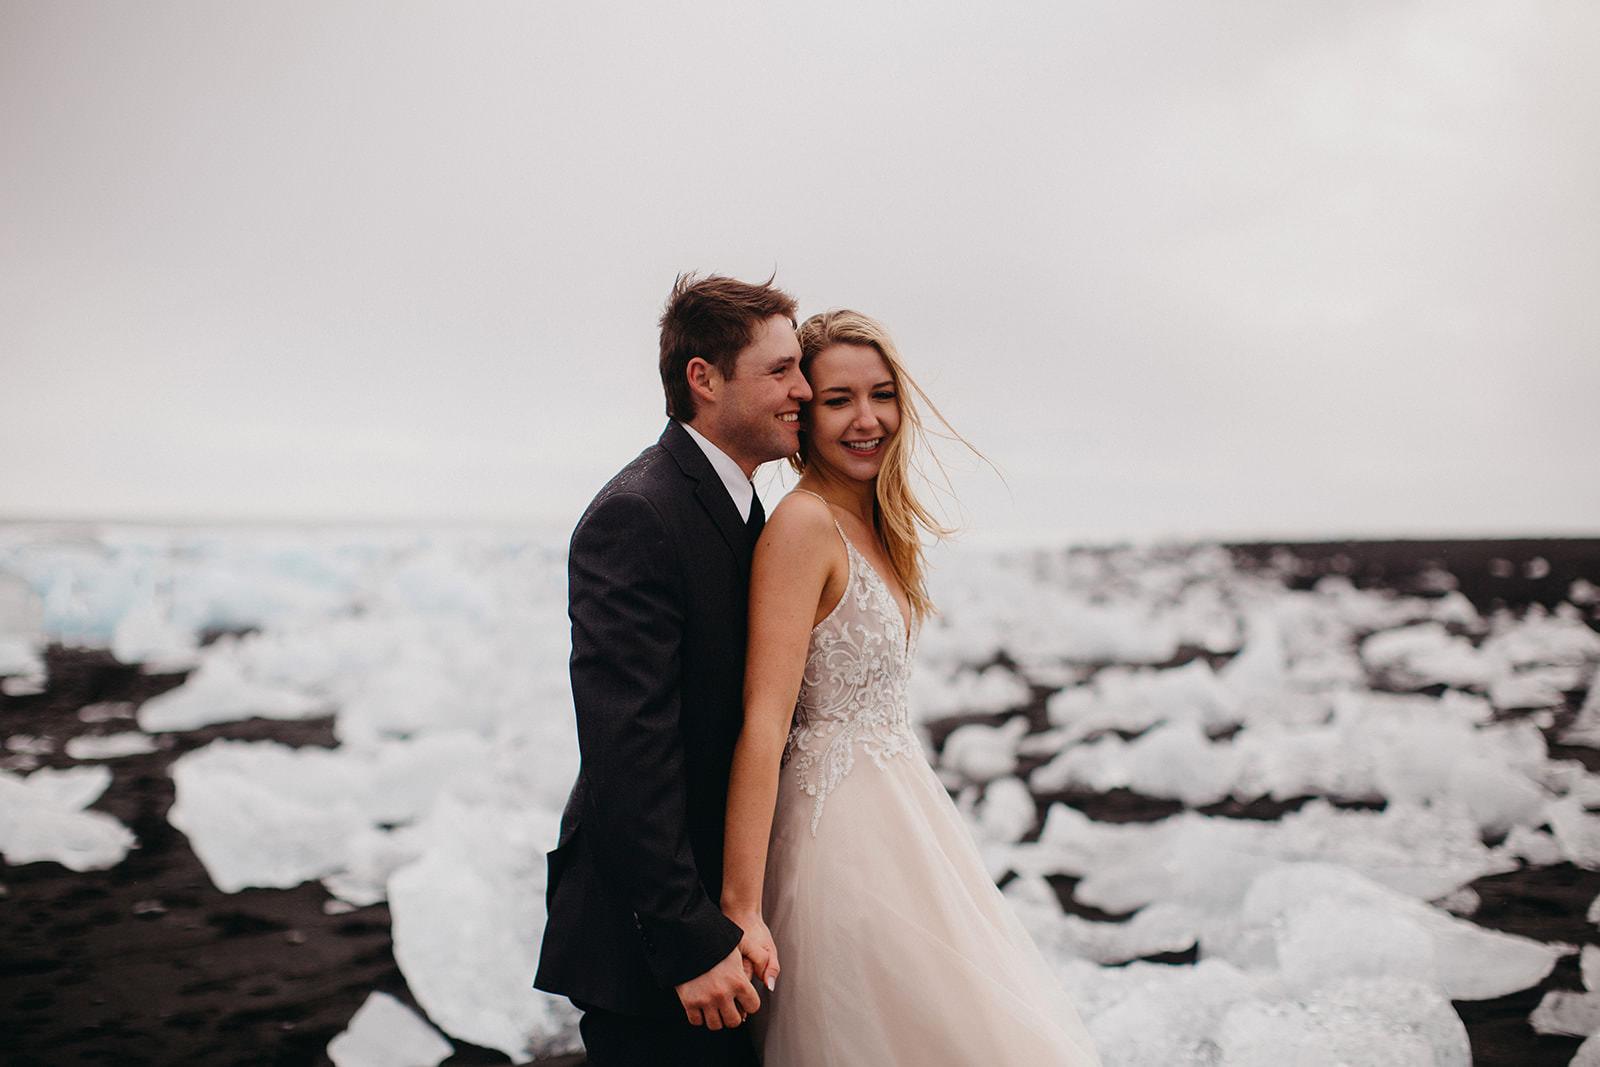 Icelandic Iceland Elopement Wedding Elope Photographer Eloping Reykjavík Vik Black Sand Beach Jökulsárlón Skogafoss Waterfall Vestrahorn Mountain Liz Osban Photography Destination 56.jpg